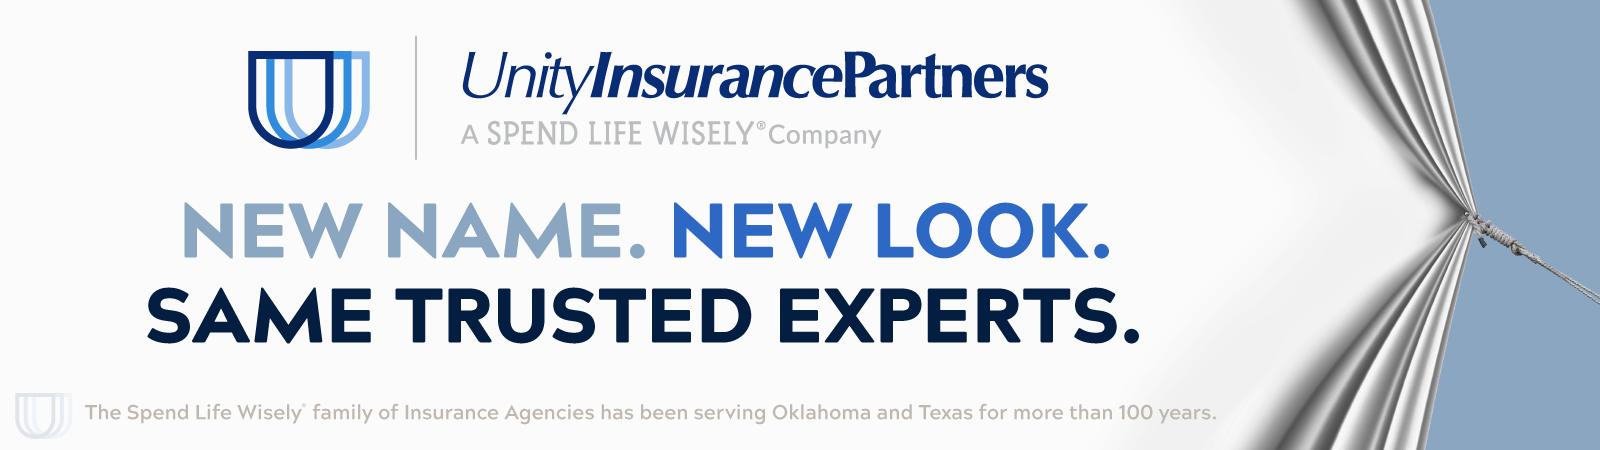 Unity Insurance Partners logo